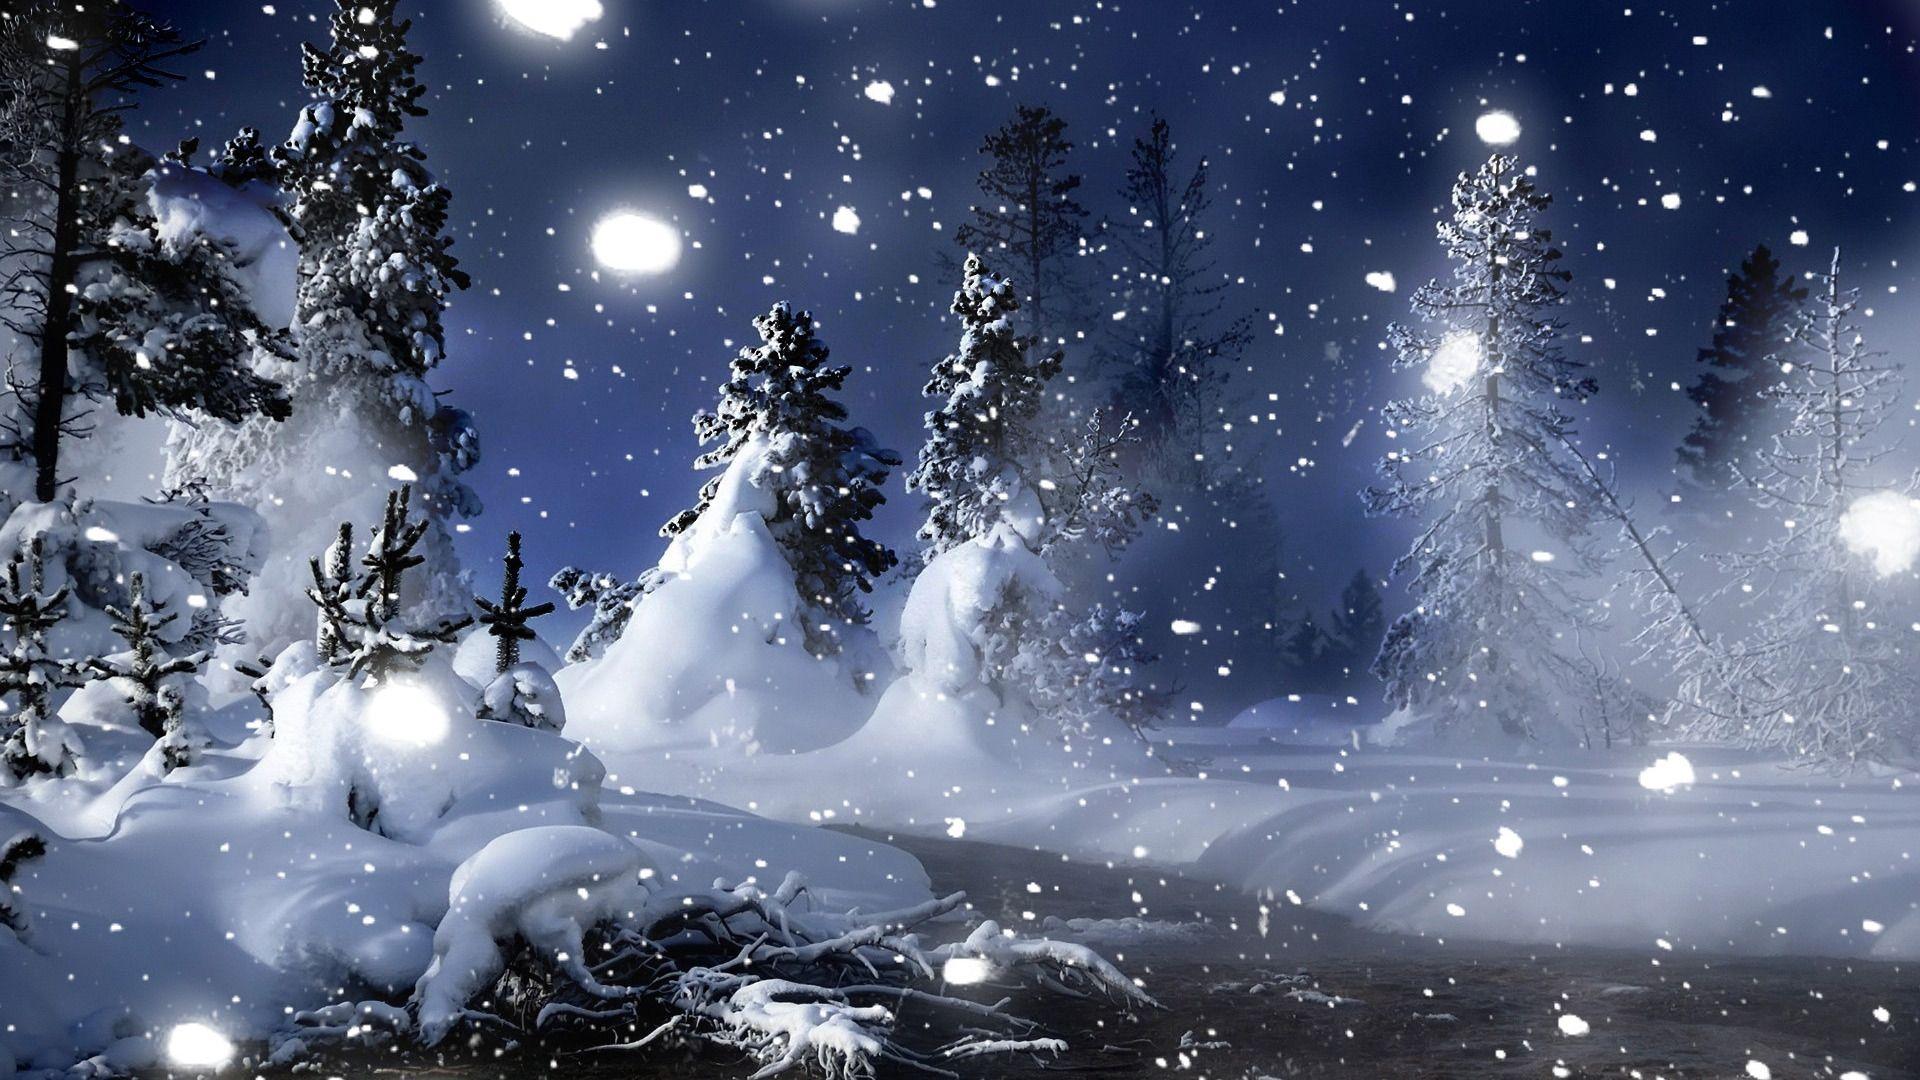 Winter Snow   Wallpaper High Definition High Quality Widescreen 1920x1080